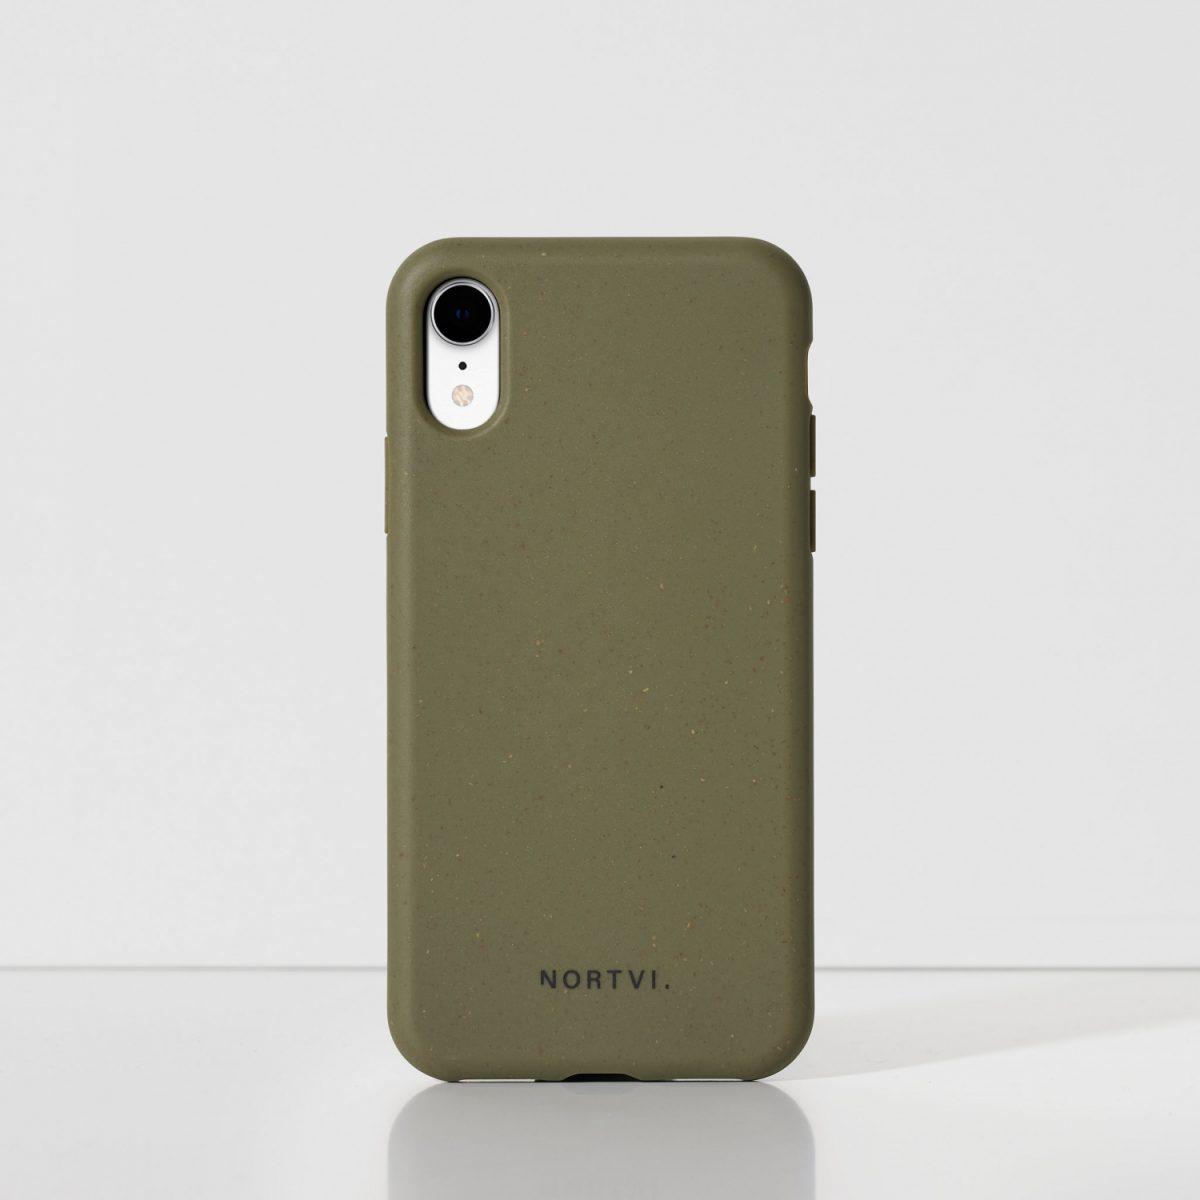 NORTVI green phone case for iPhone XR case